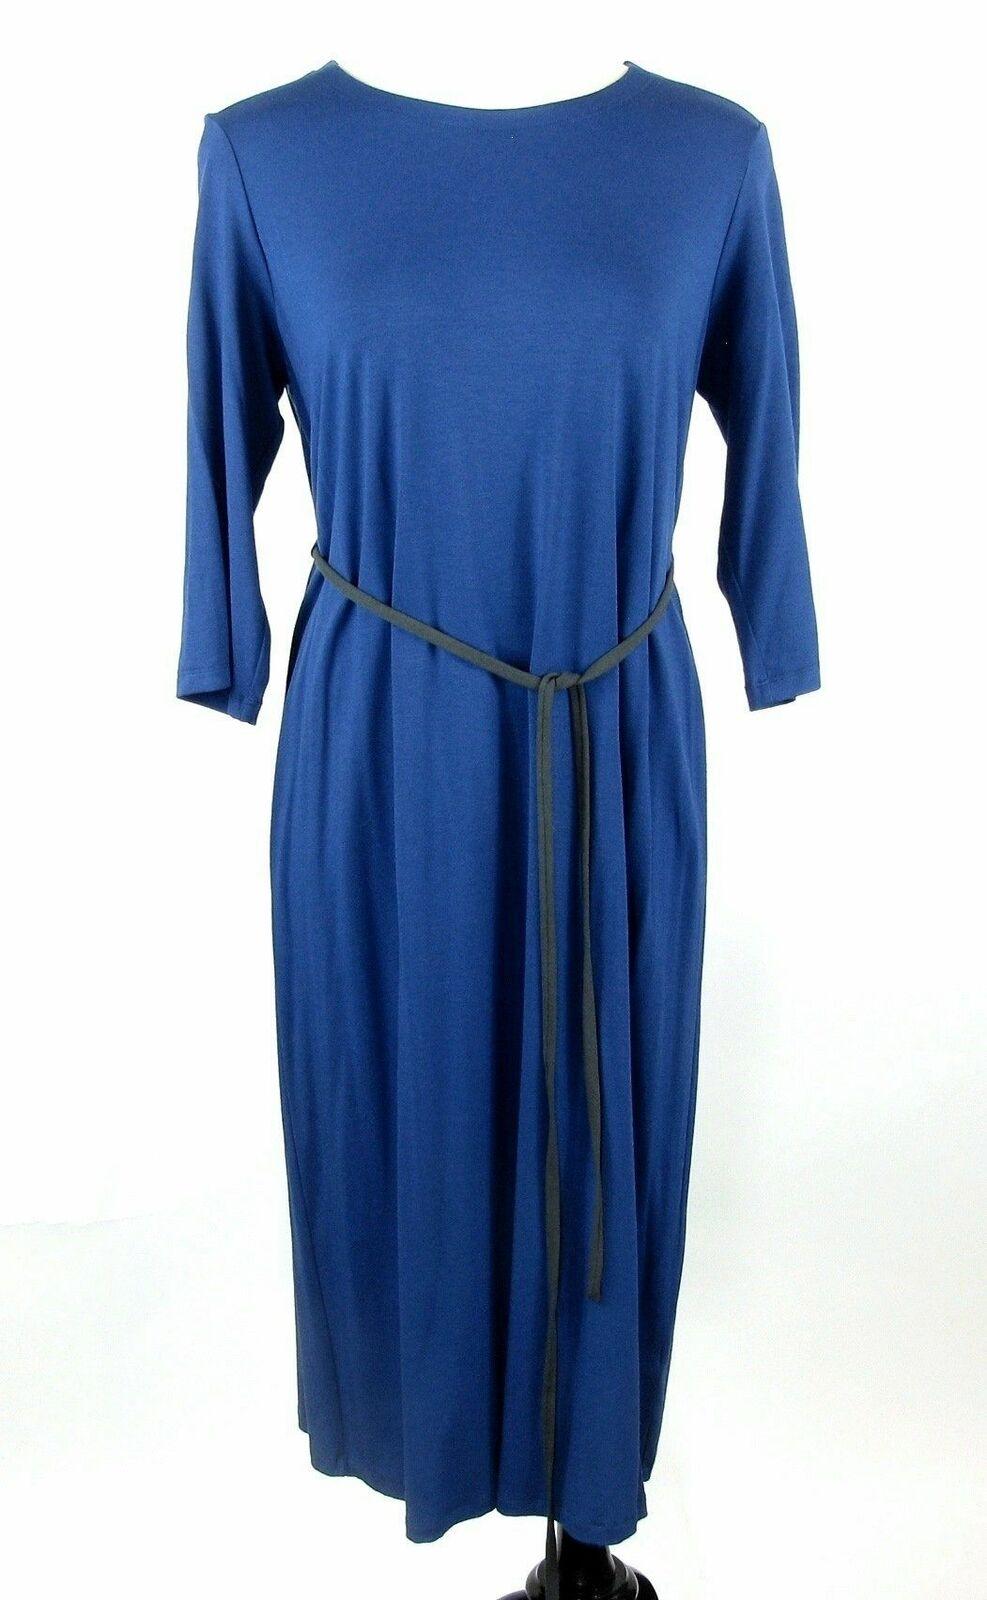 Eileen Fisher Fisher Fisher Size S bluee Jersey Knit Dress 0b17c0